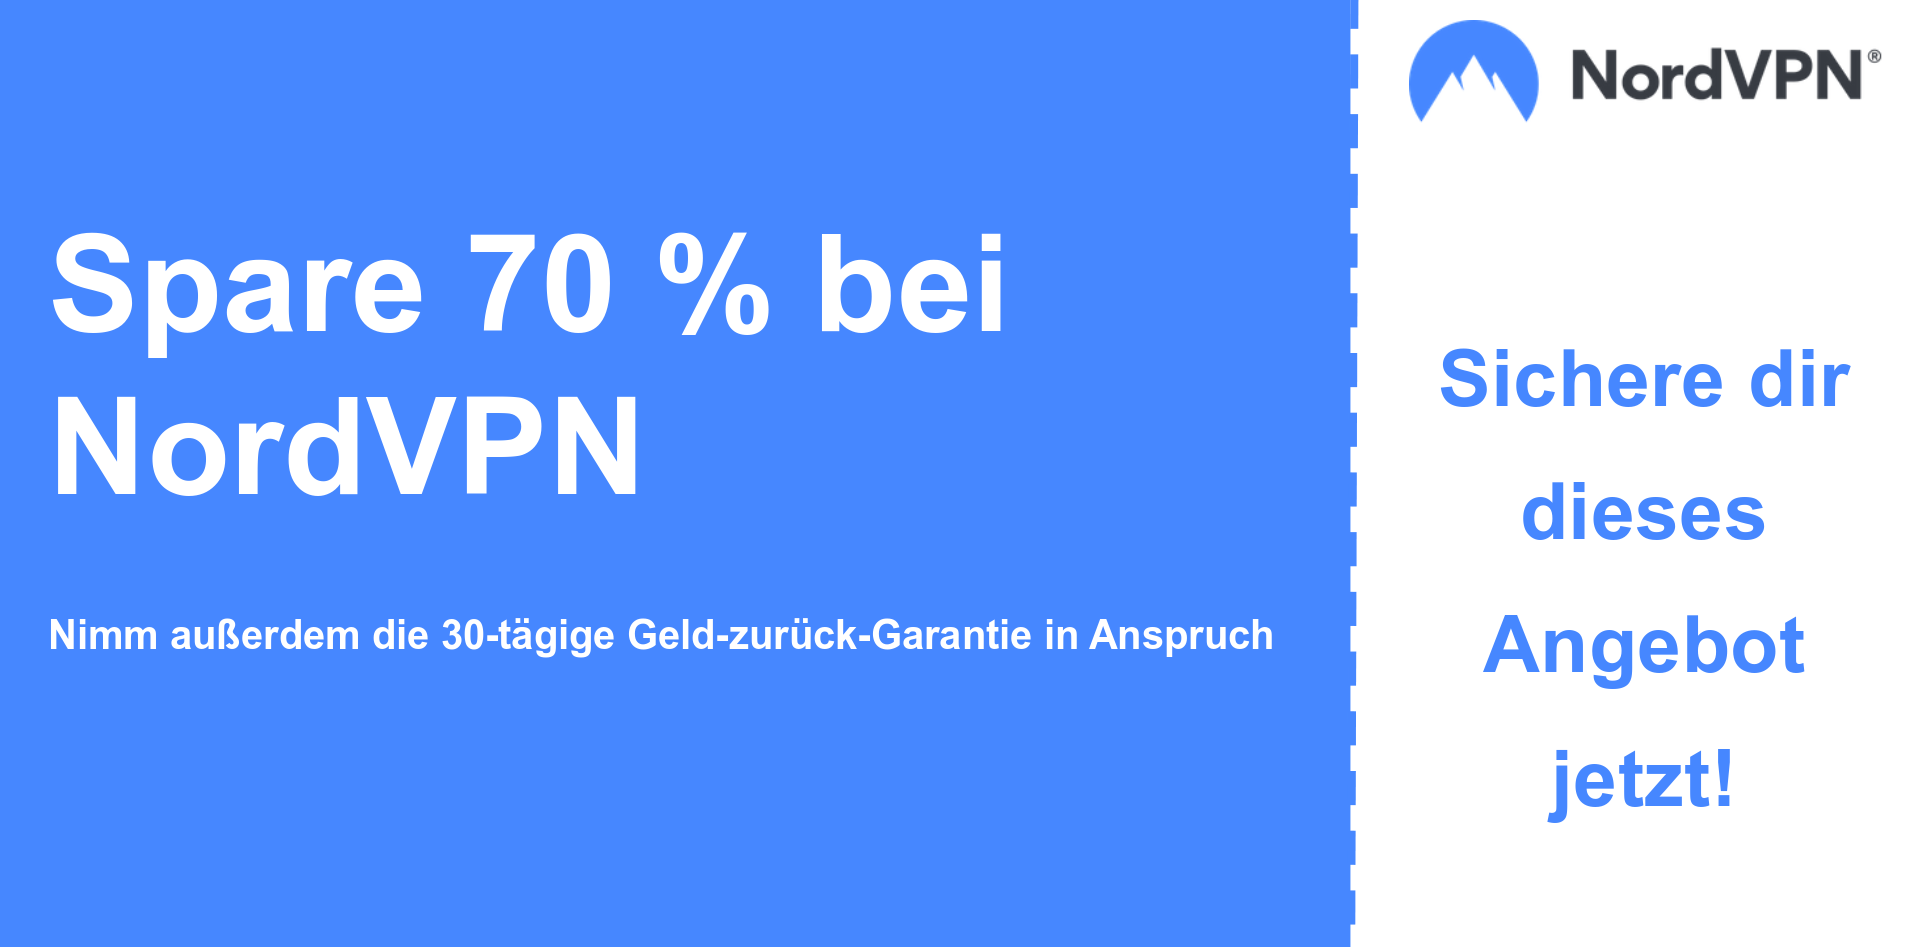 Grafik des Nordvpn-Hauptcoupon-Banners mit 70% Rabatt